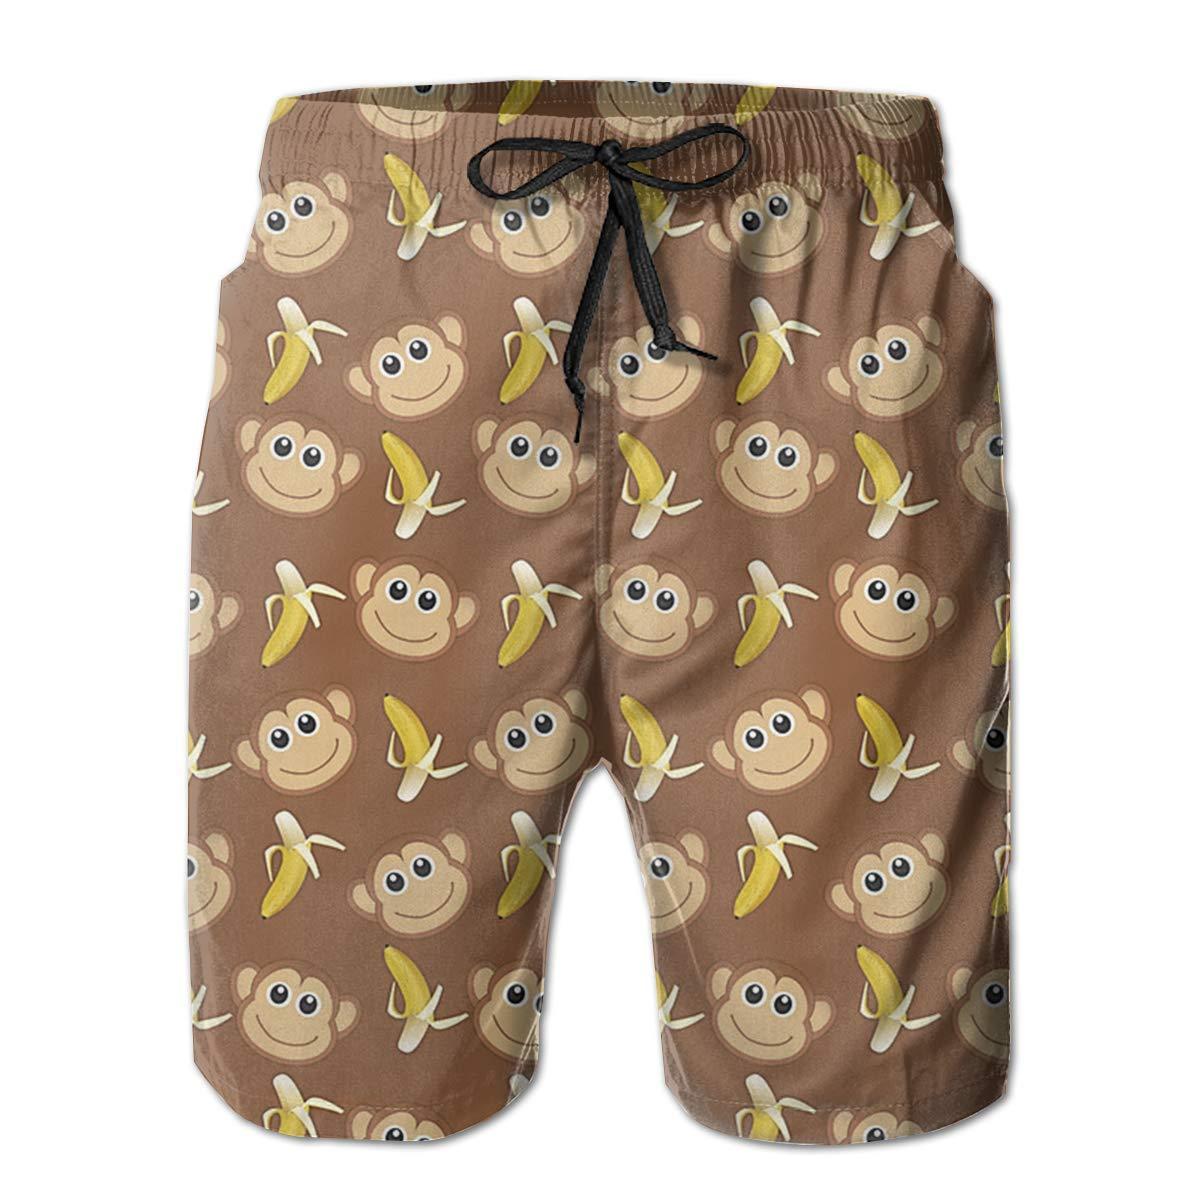 Life Pstore Mens Quick Dry 3D Printed Beach Trunks Board Shorts Casual Summer Swimwear Pants